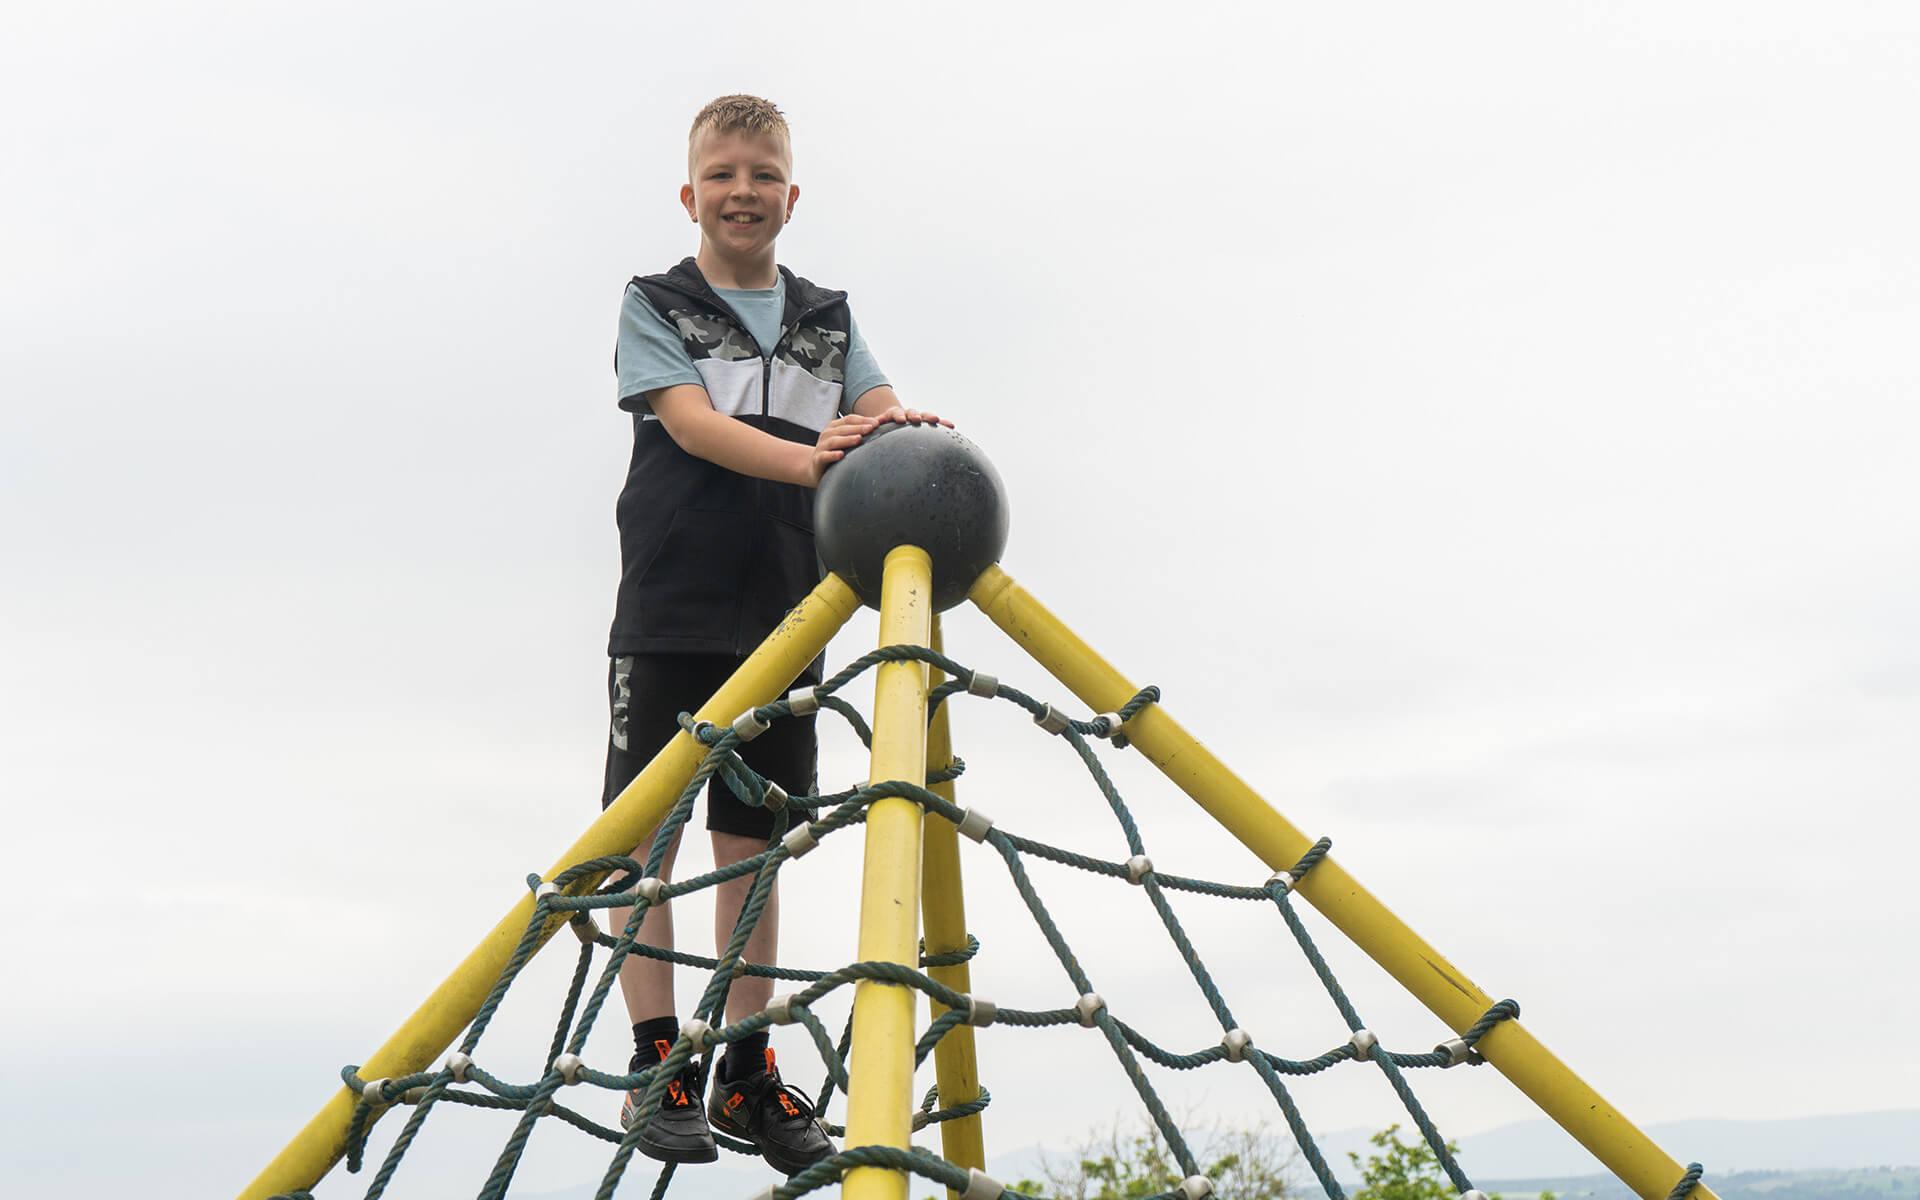 Child of Courage - Aaron Hunter